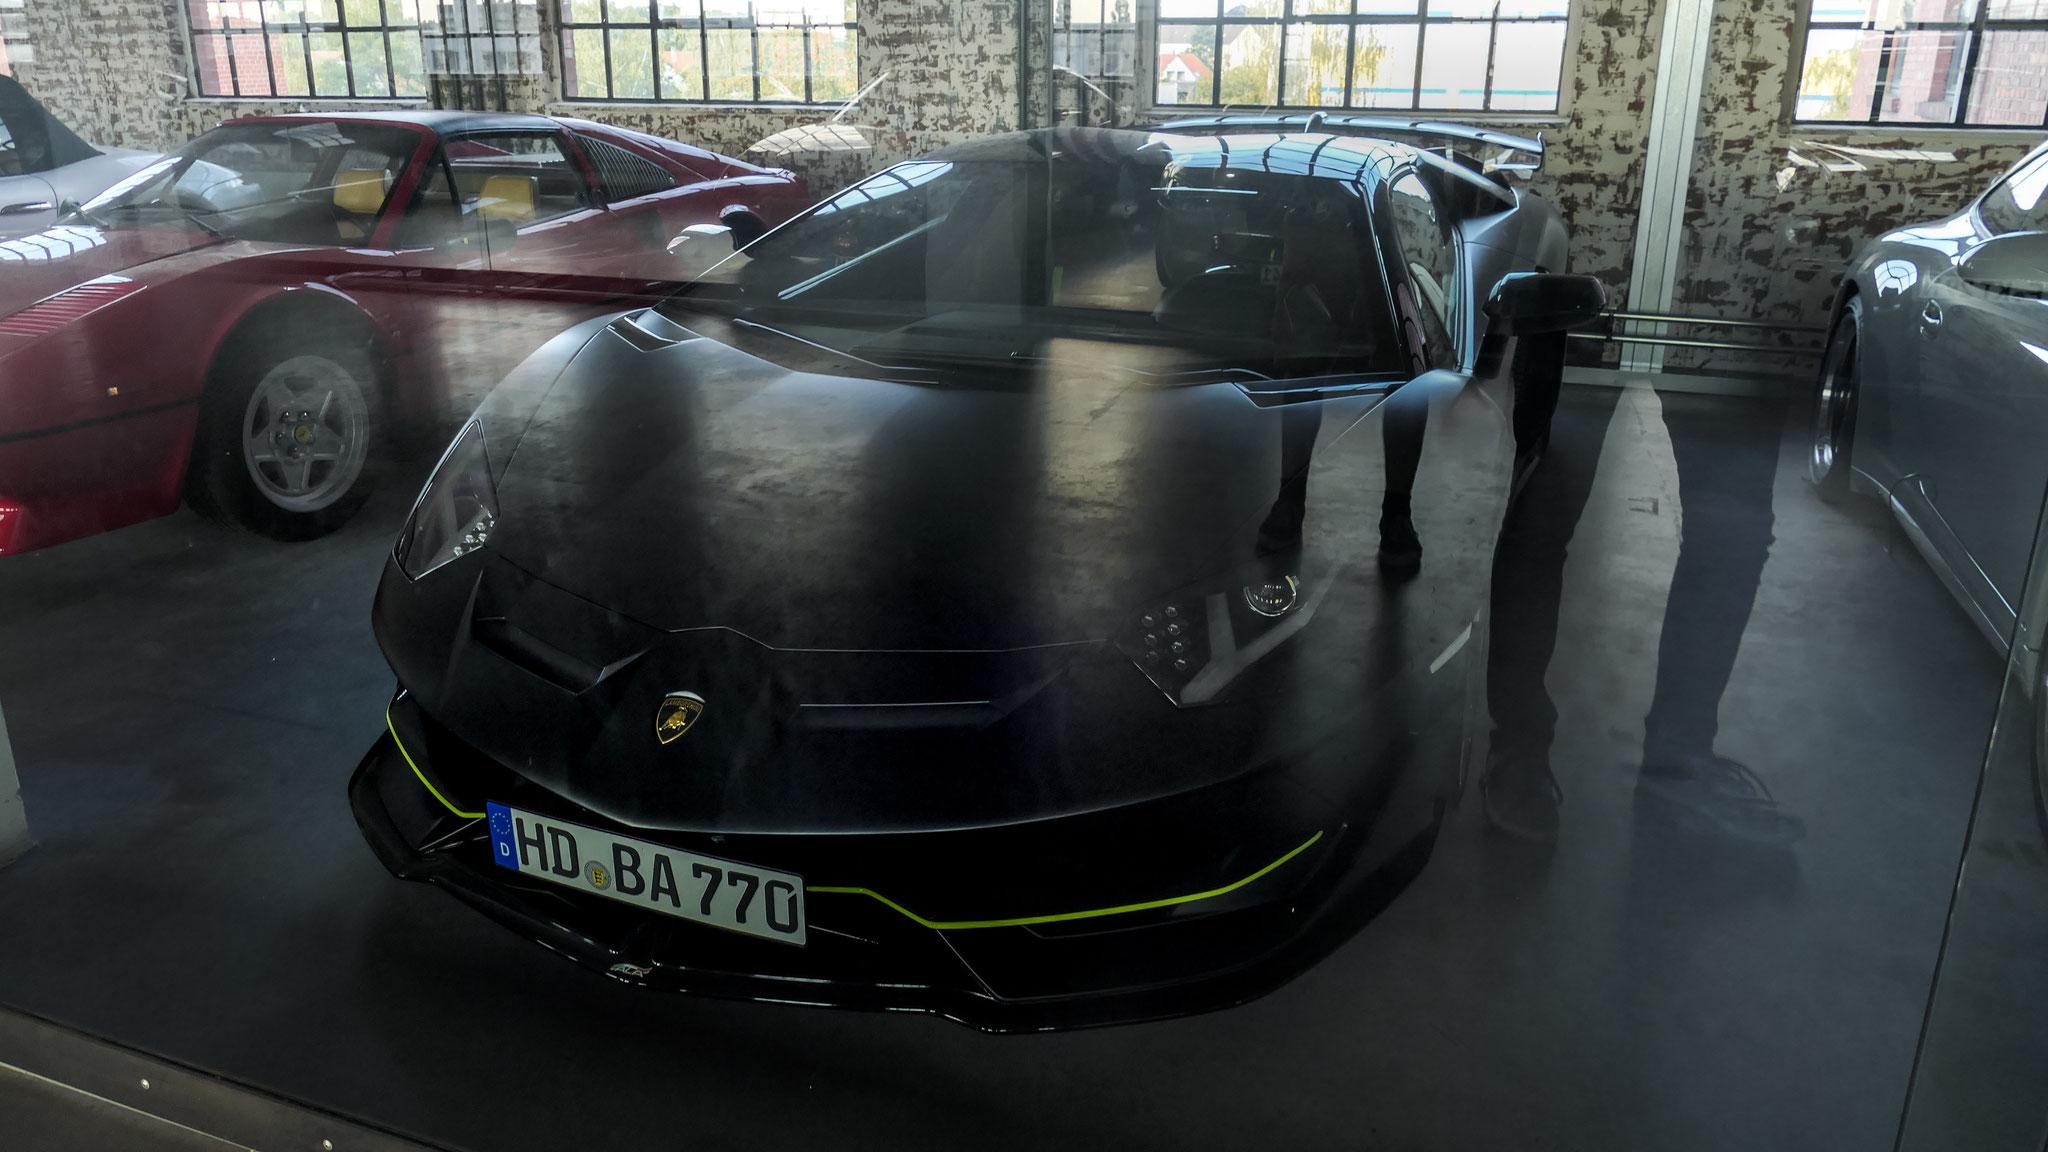 Lamborghini Aventador LP 770 SVJ - HD-BA-770